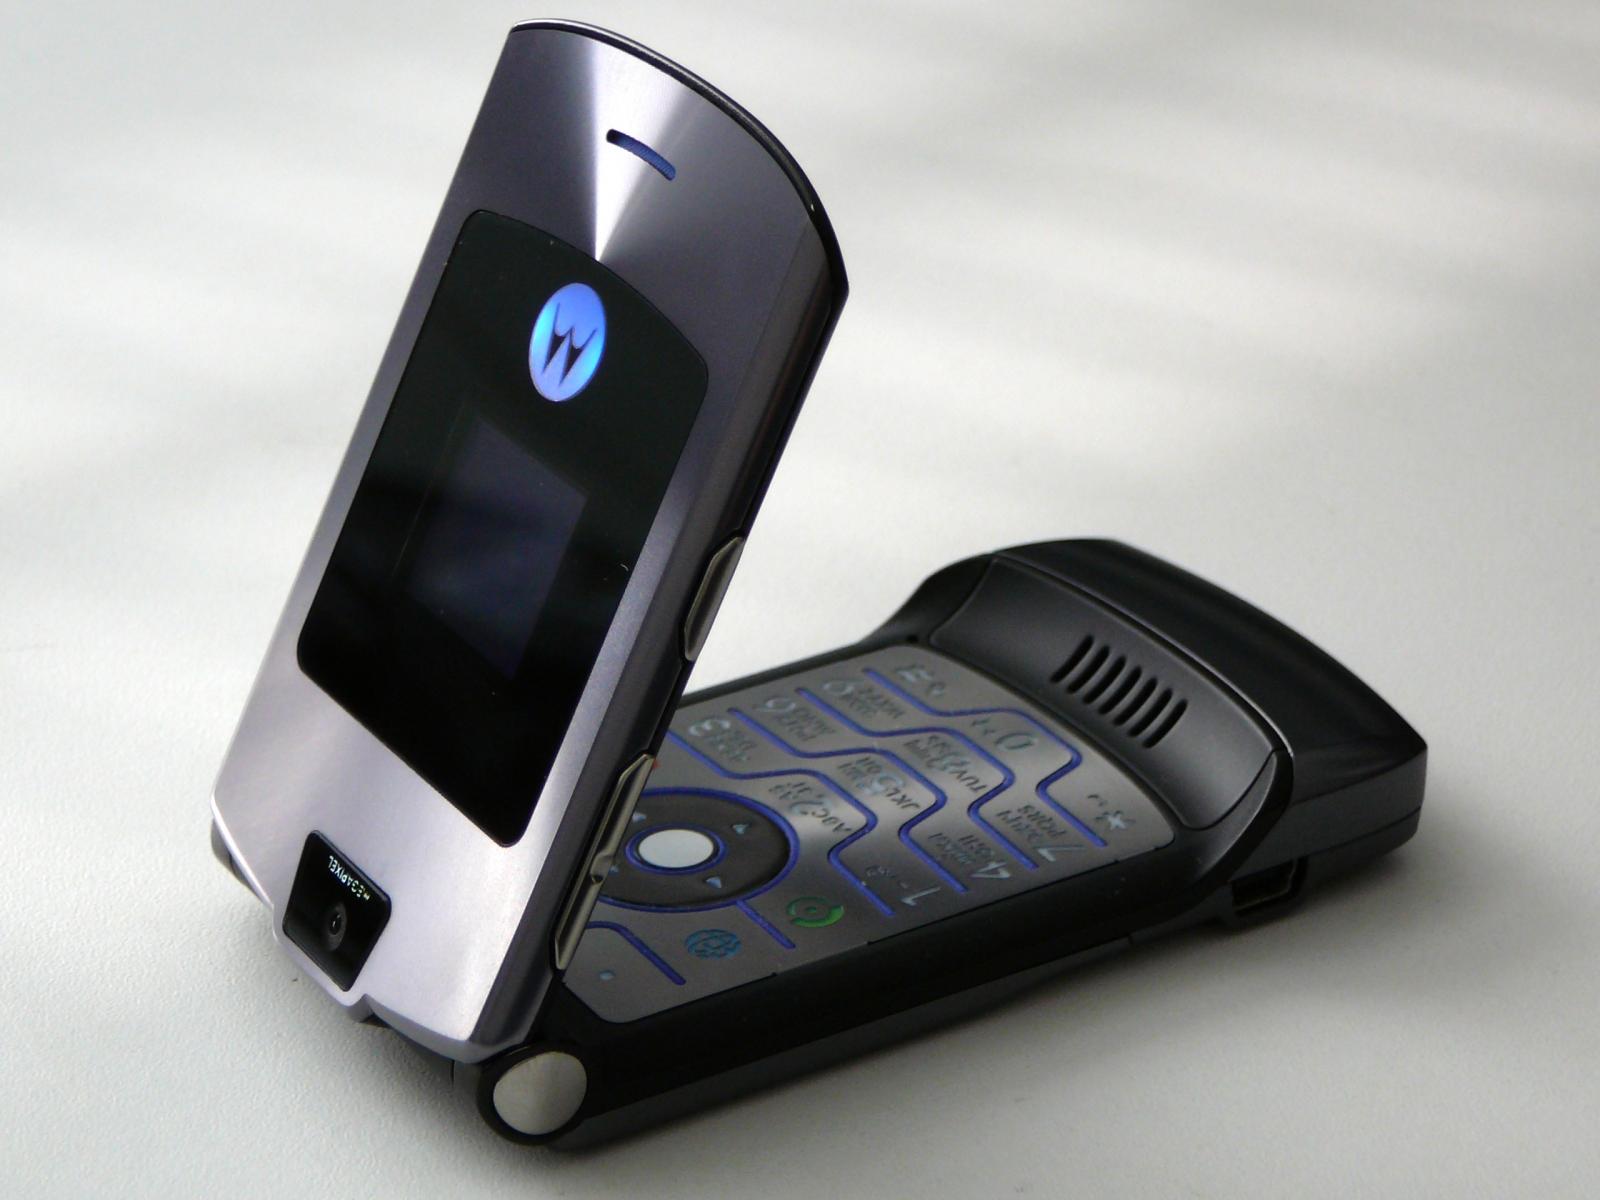 Motorola RAZR V3i mobile phone